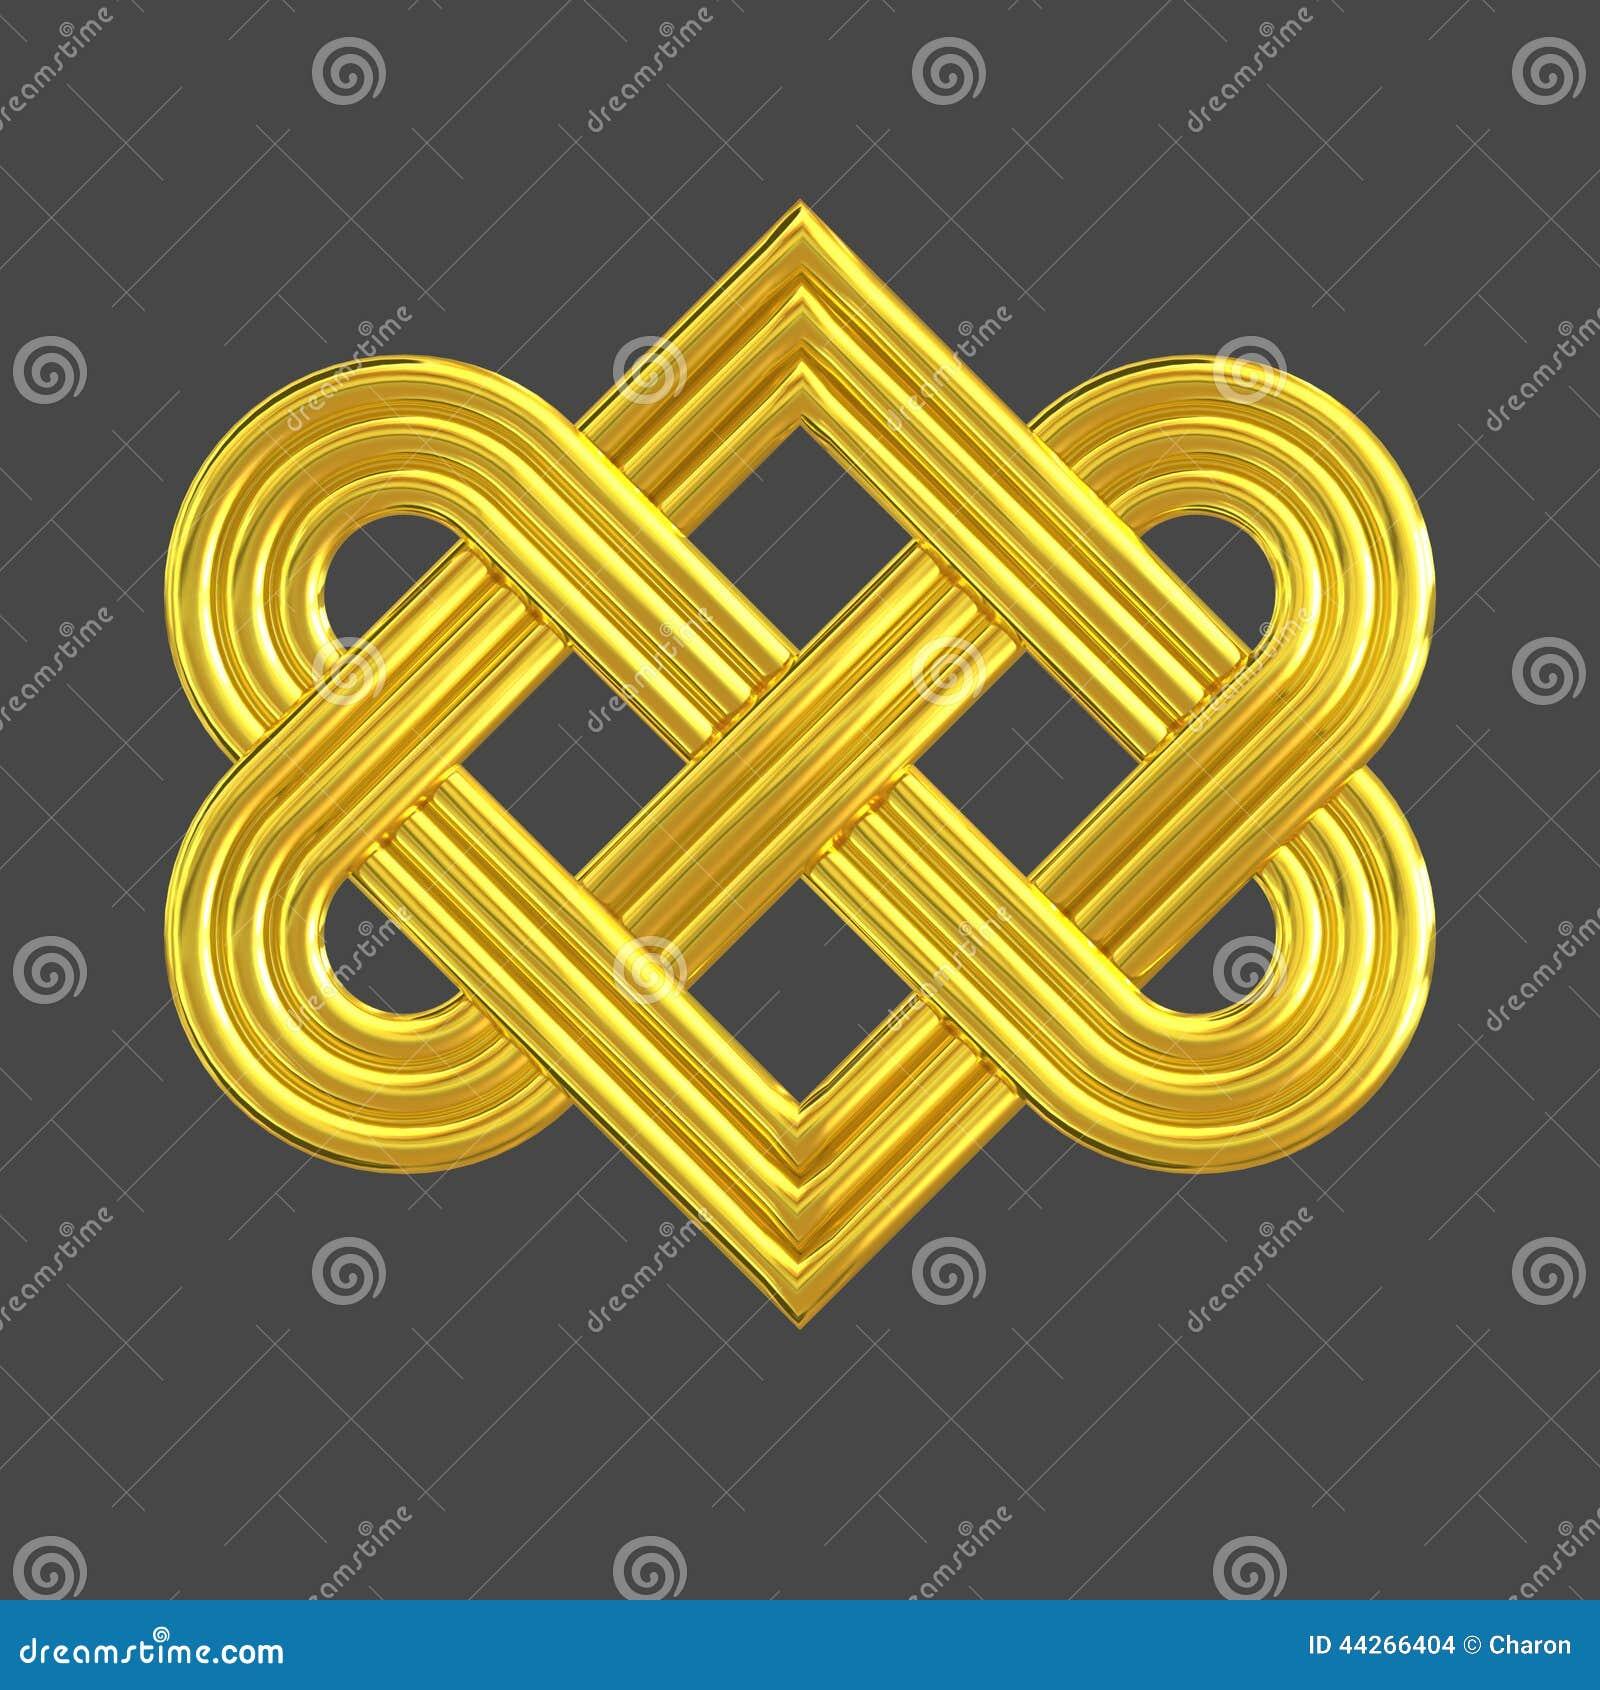 Gold eternal knot charm symbol stock image image of image golden interlocking heart knot symbol stock images biocorpaavc Gallery